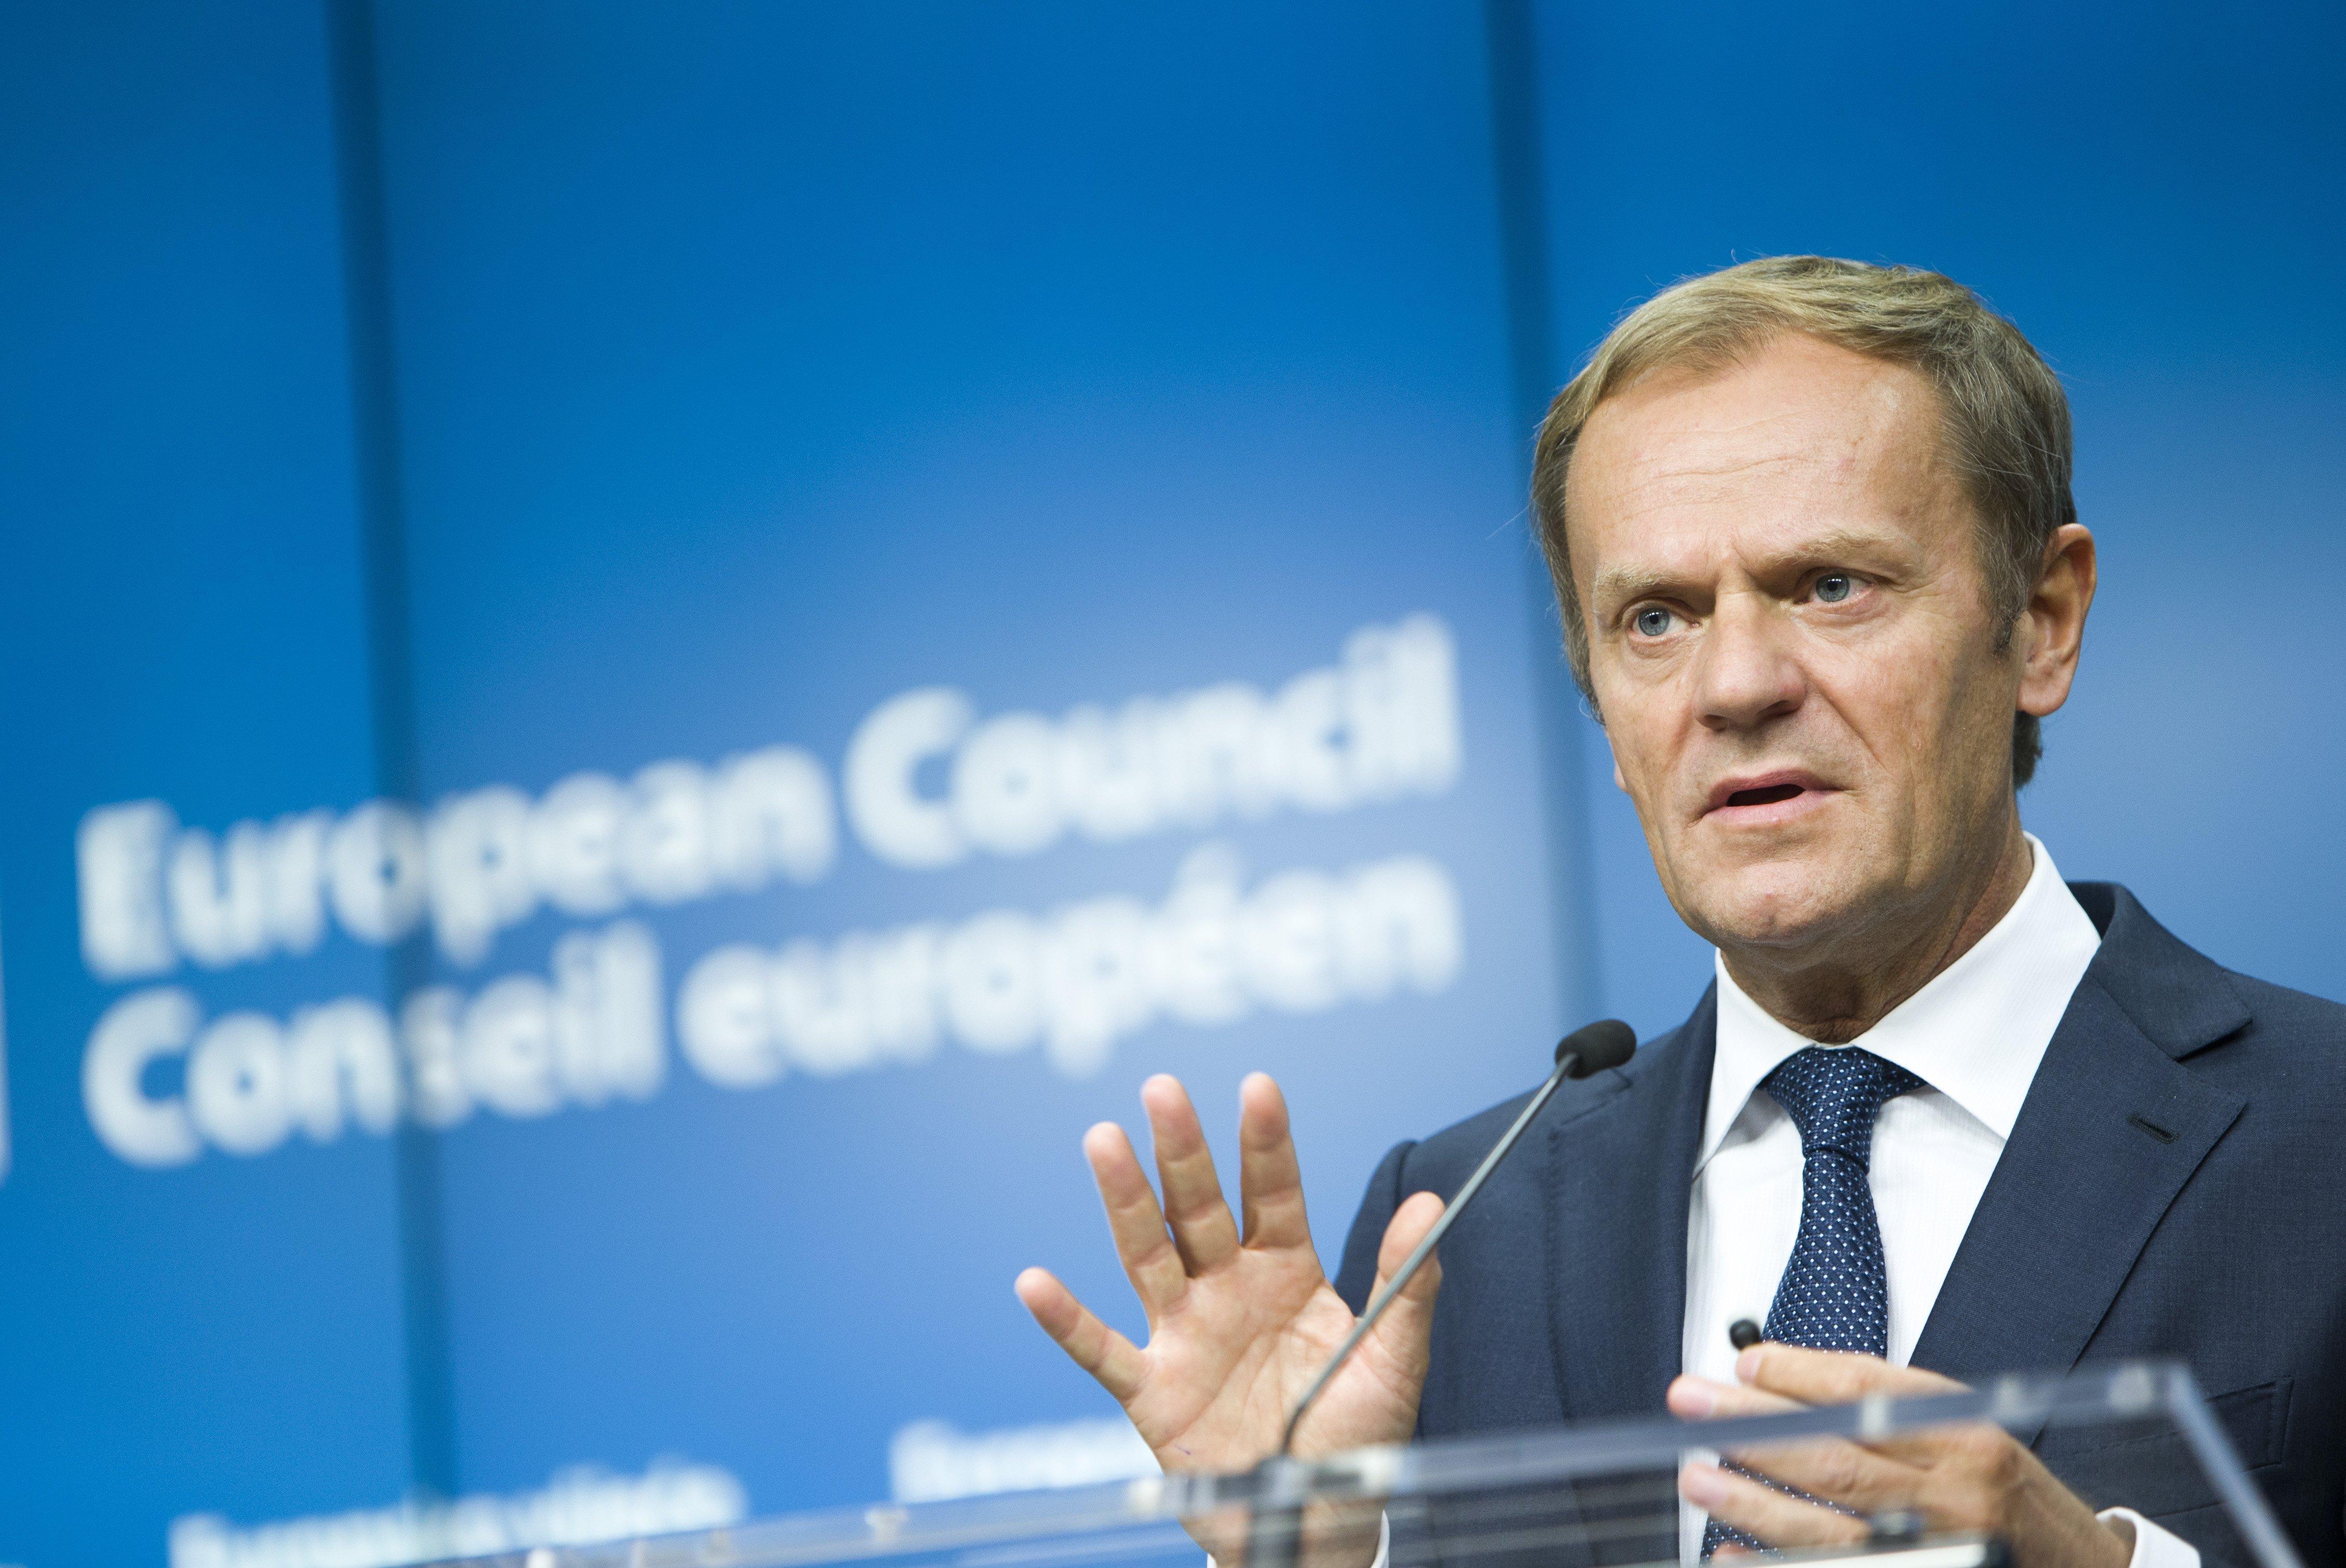 Tusk reelegido presidente del consejo europeo a pesar de for Presidente del consejo europeo